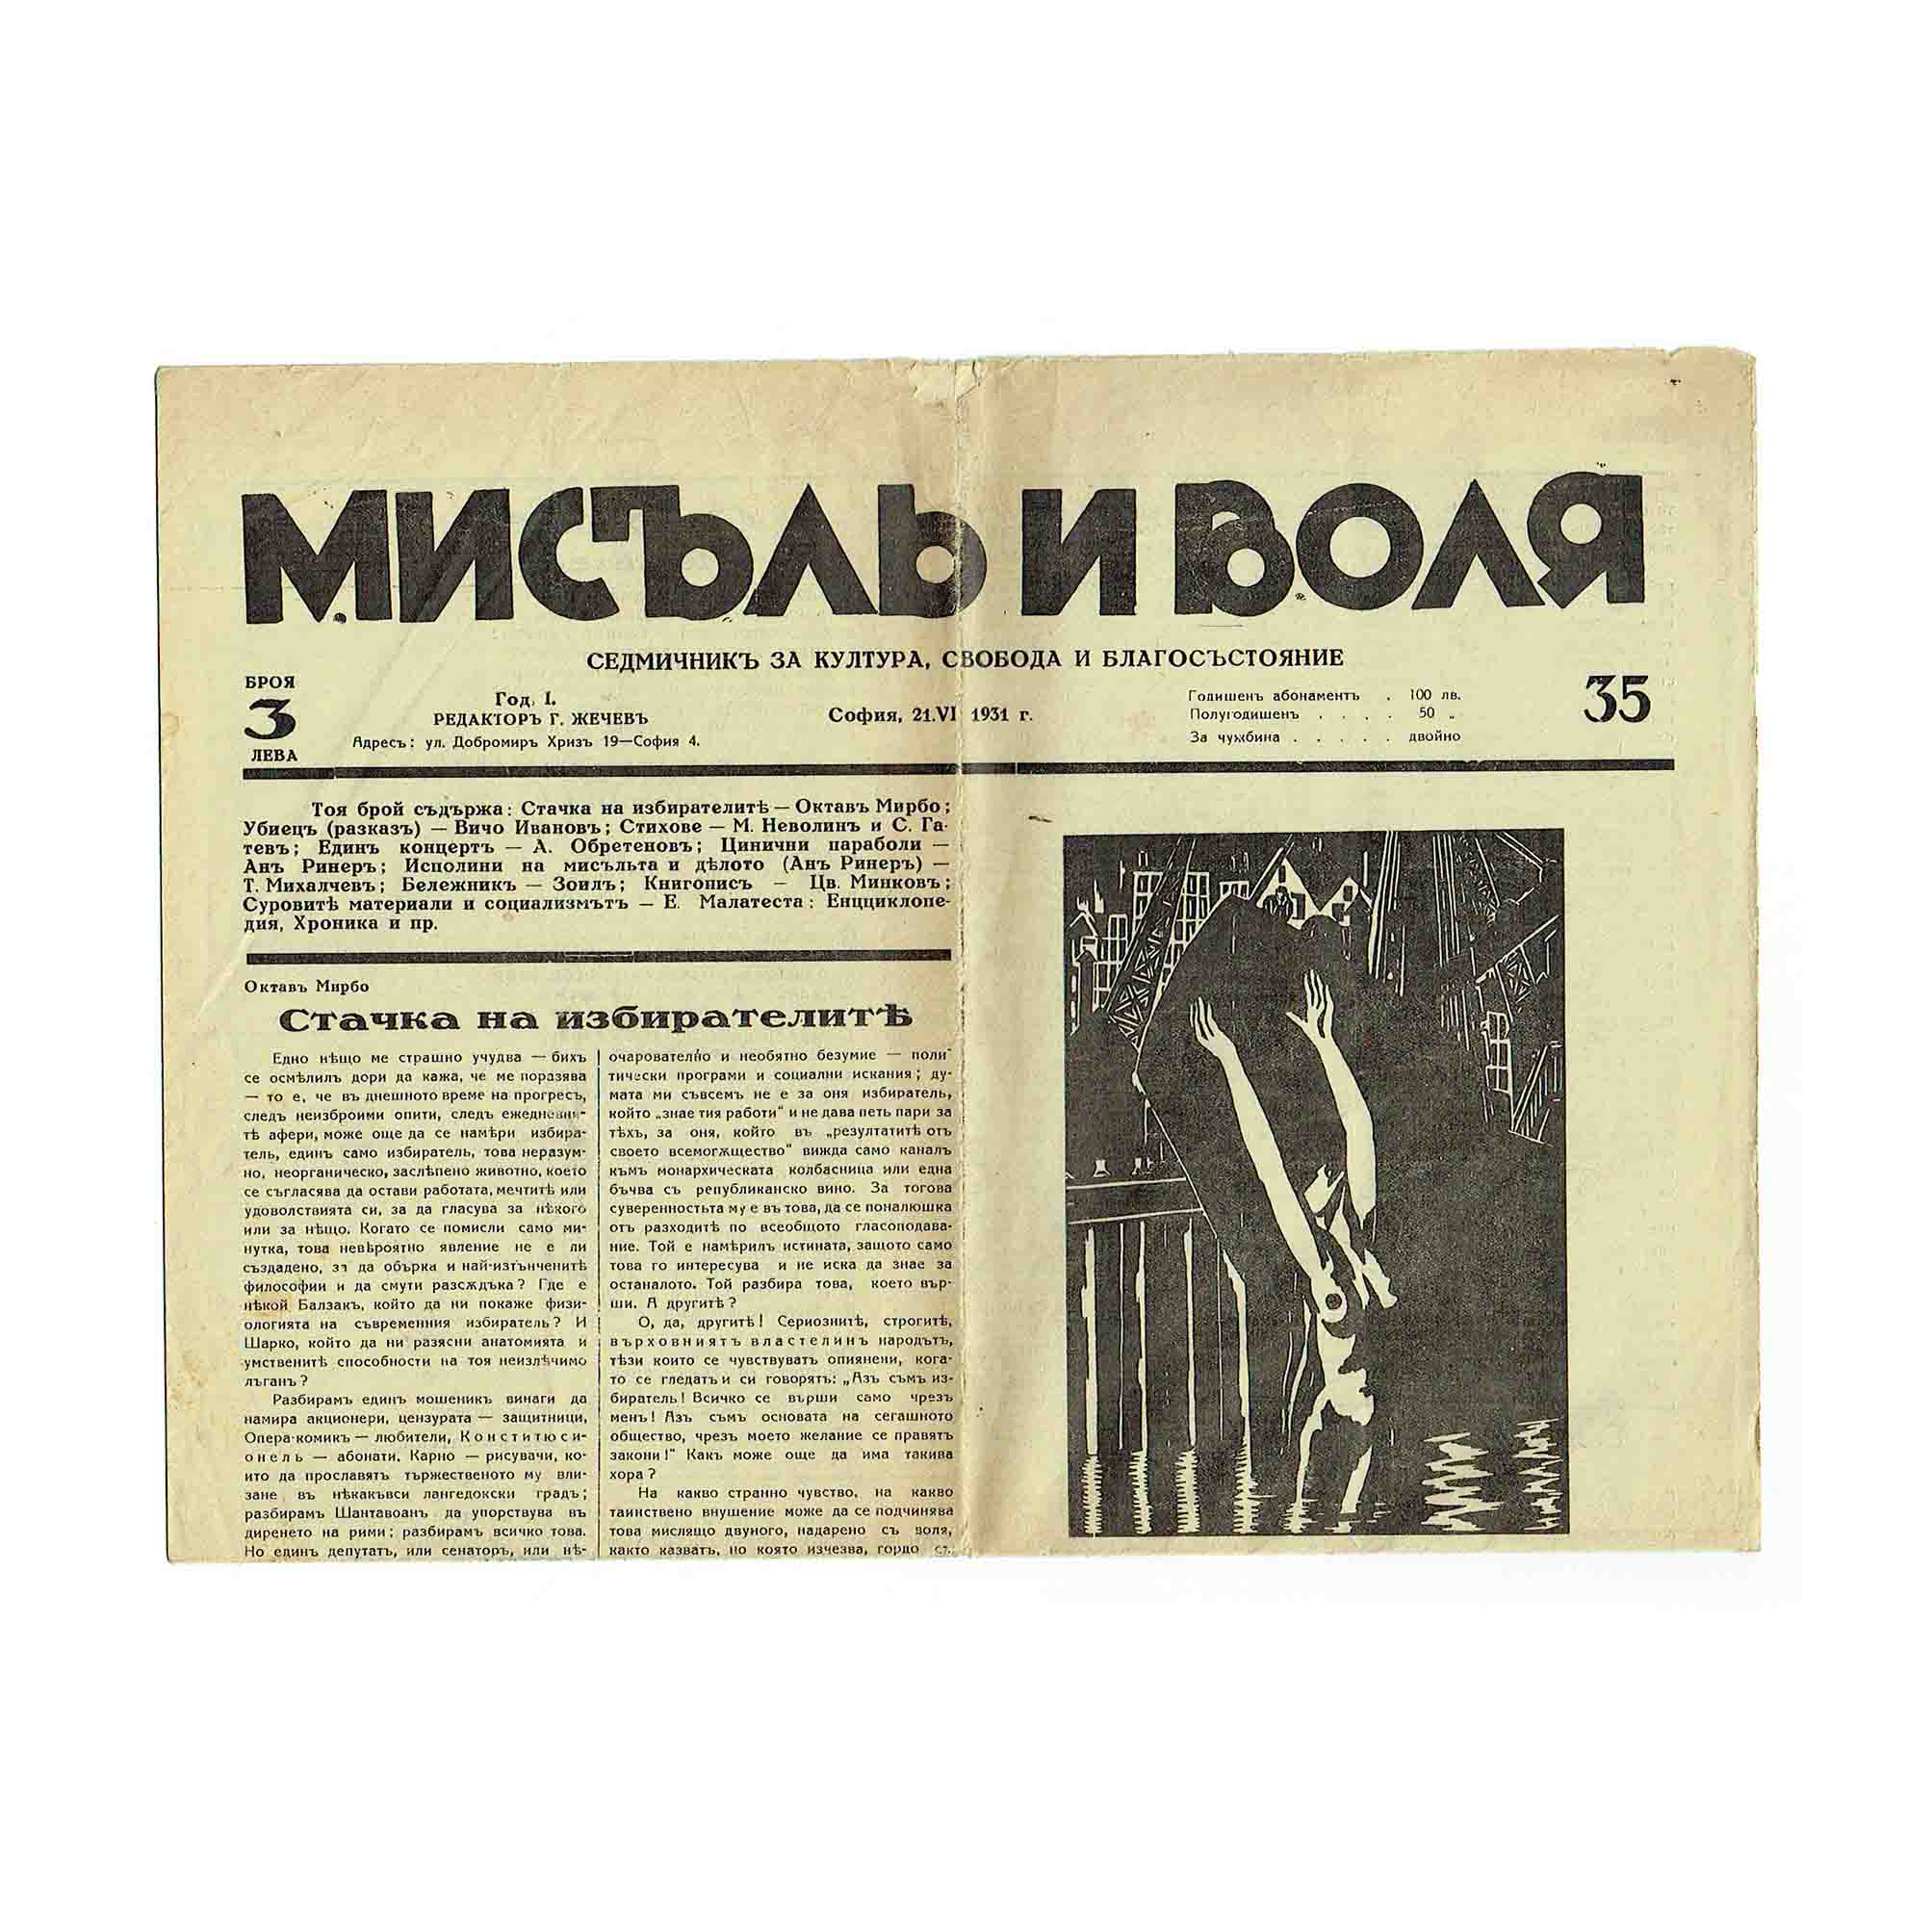 5852-Misal-i-Volya-Gedanke-und-Wille-I-35-1931-Masereel-Titelblatt-A-N.jpeg